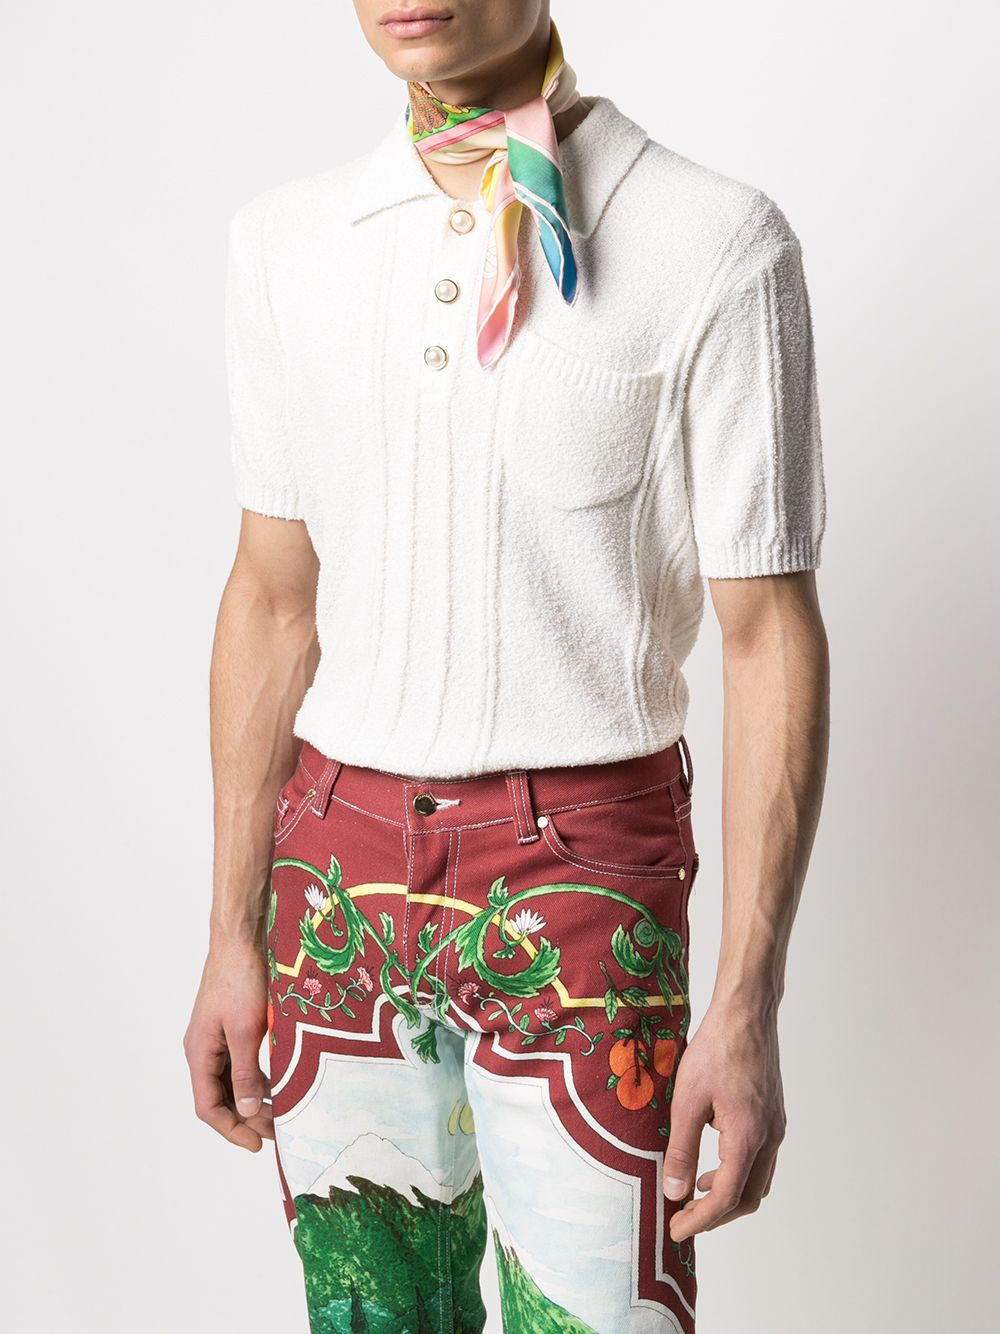 Casablanca sciarpa bandana in seta con stampa grafica uomo CASABLANCA | Sciarpe | AS21-SCARF-003LUCID